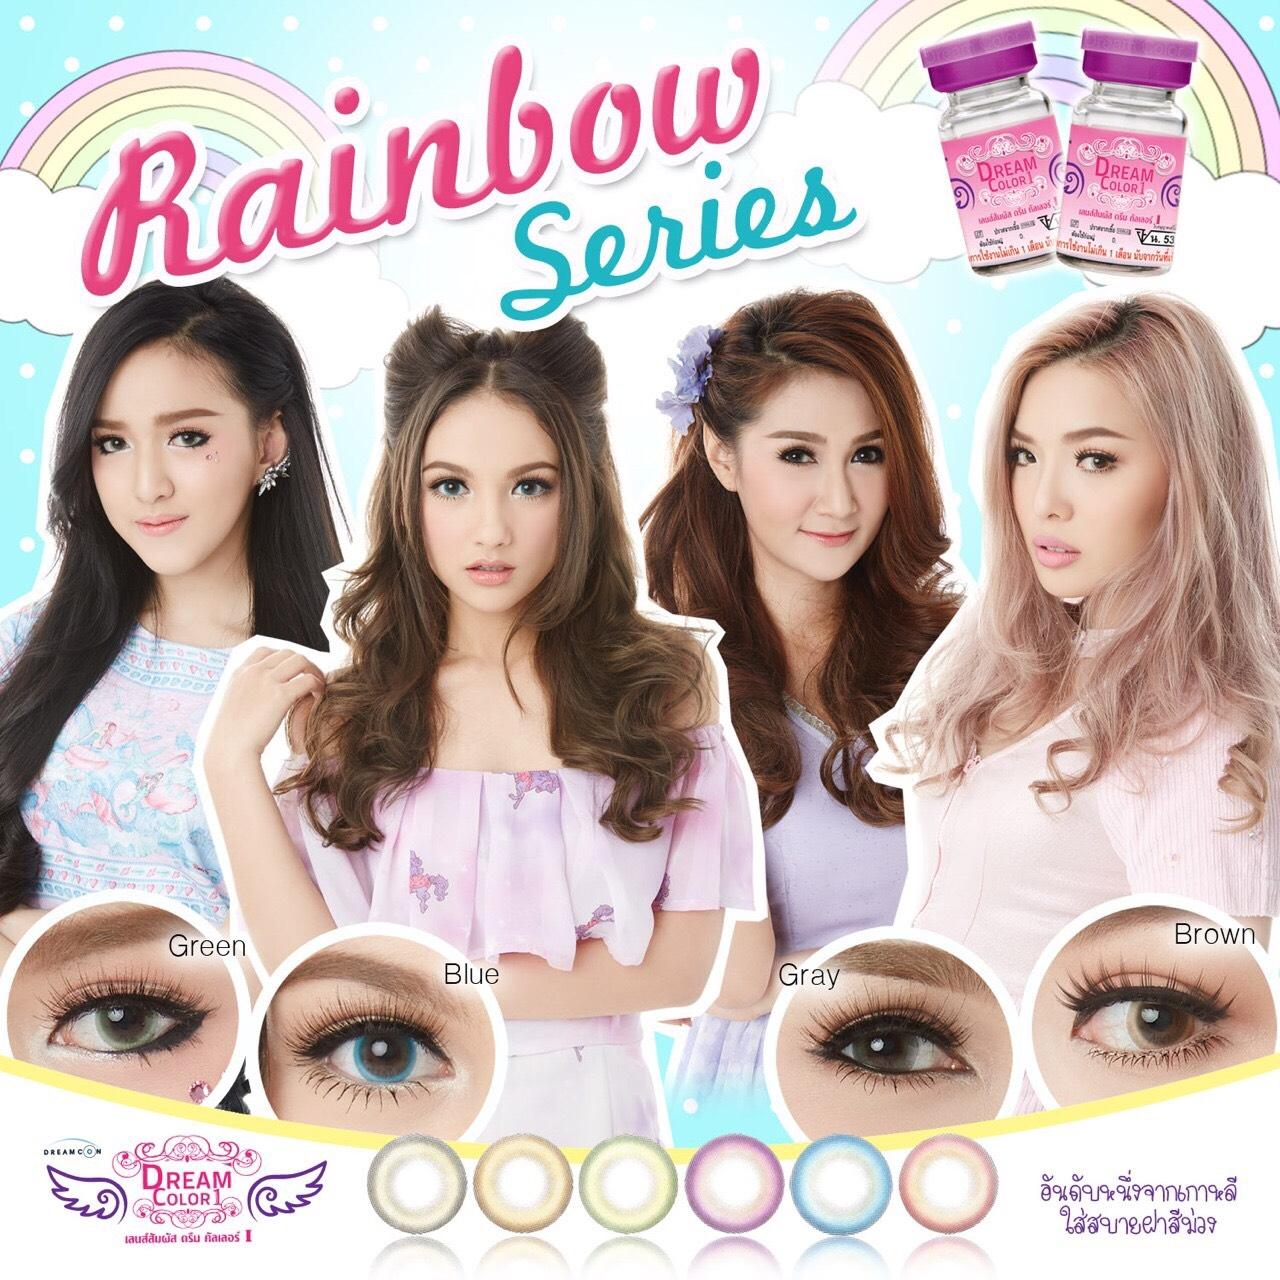 Rainbow Pink Dreamcolor1เลนส์นิ่มใส่สบาย คอนแทคเลนส์ ขายส่งคอนแทคเลนส์ ขายส่งBigeye Bigeyeเกาหลี